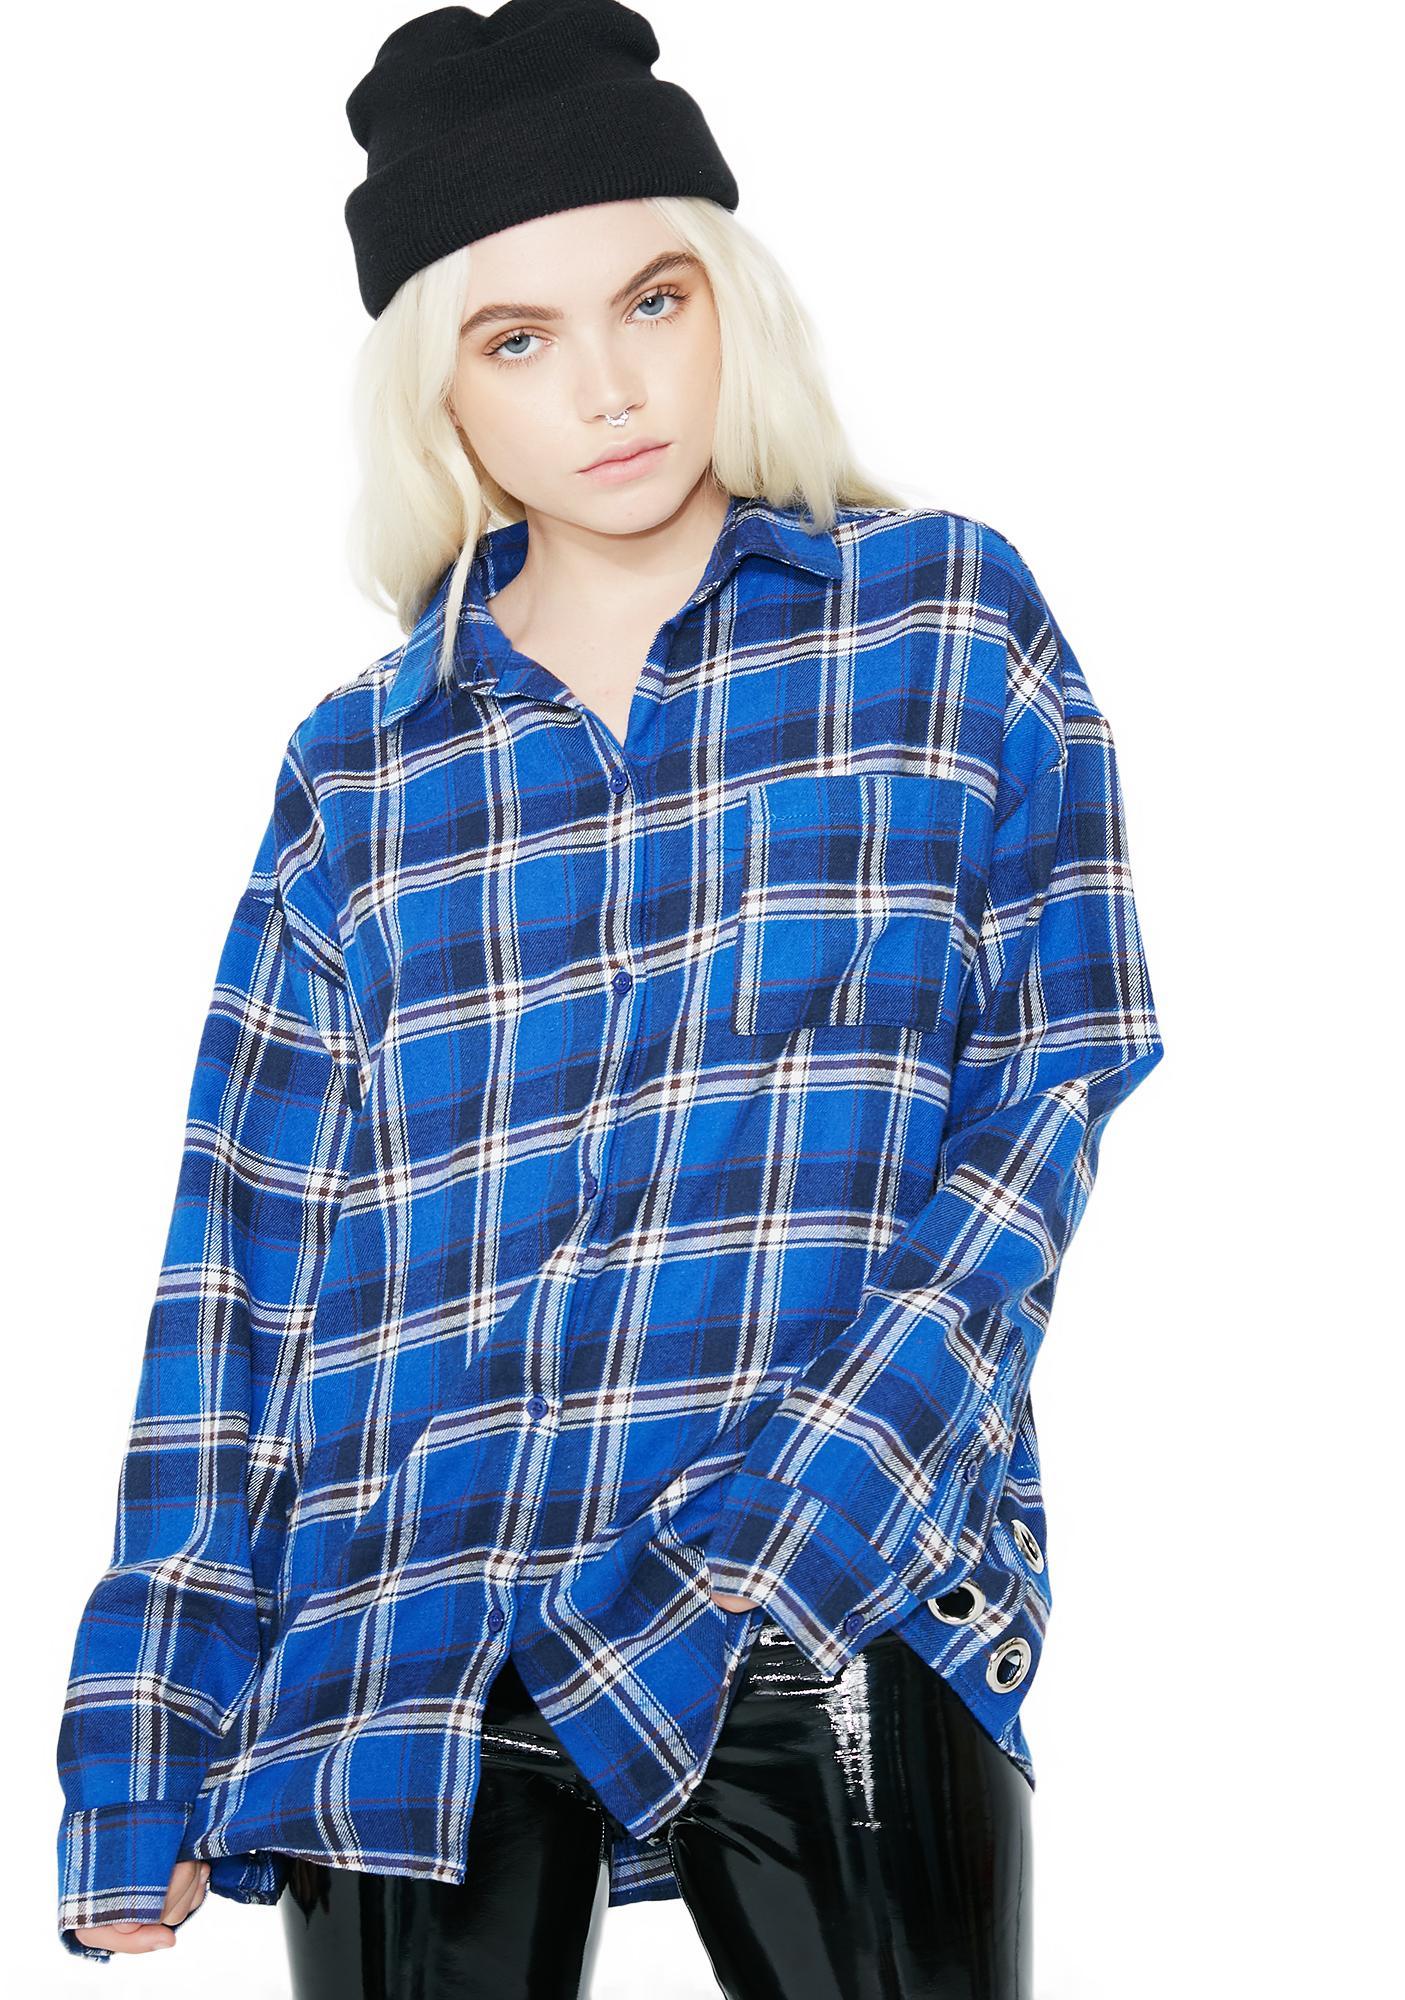 303b65cd8144f3 Plaid Grommet Blue Flannel Top